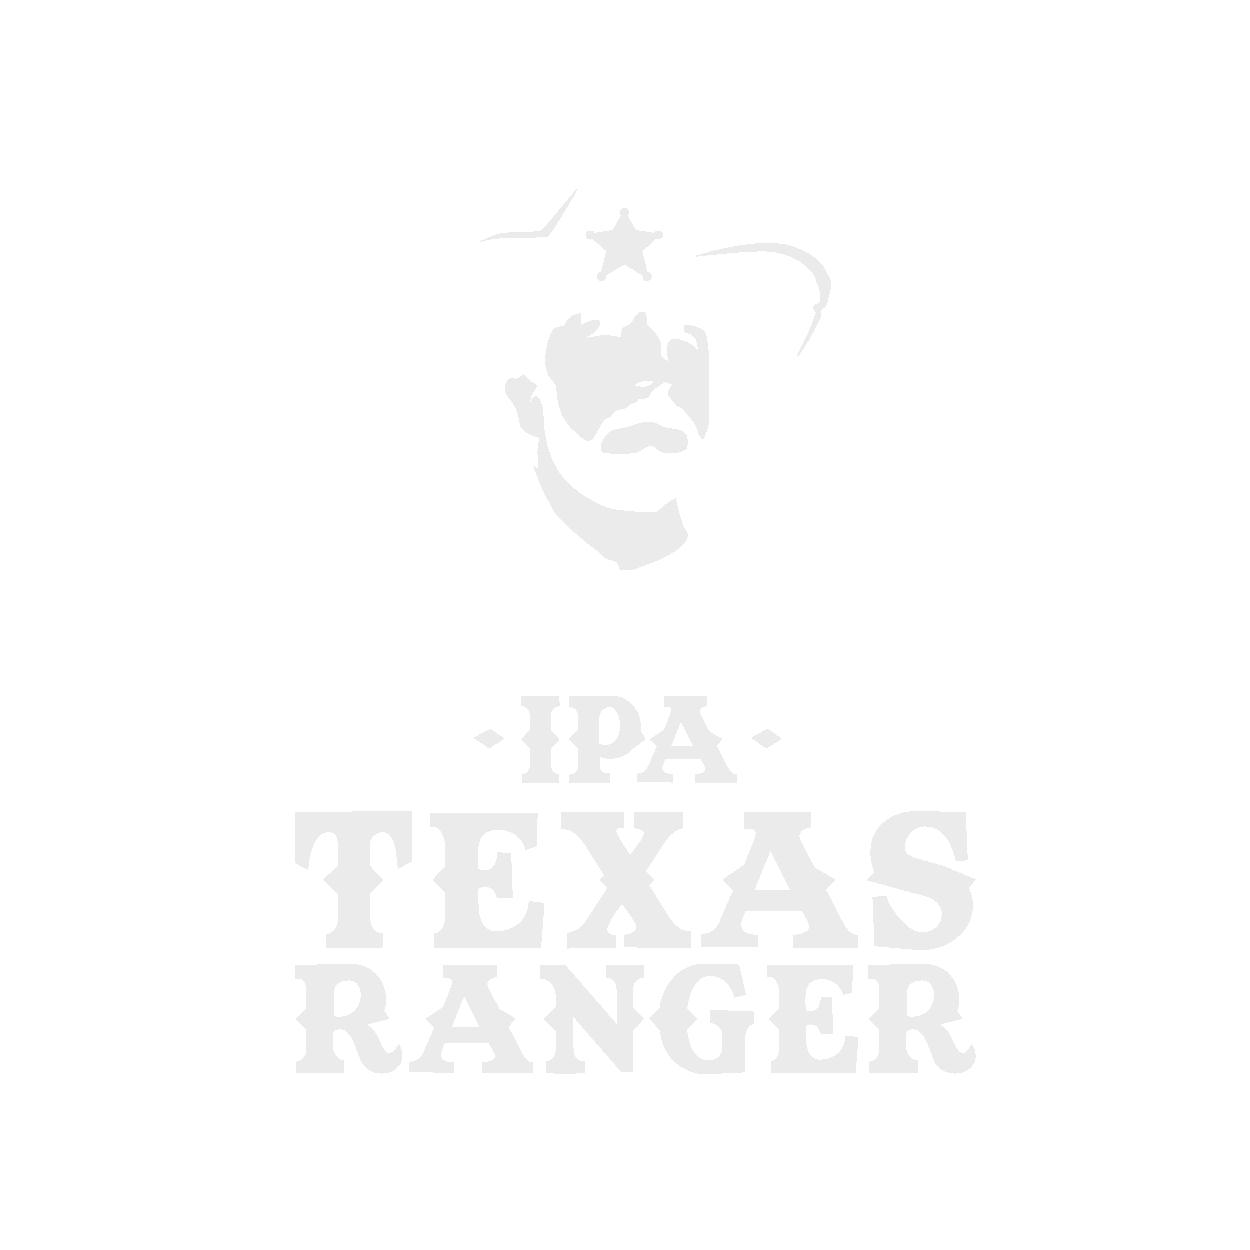 IPA Texas Ranger